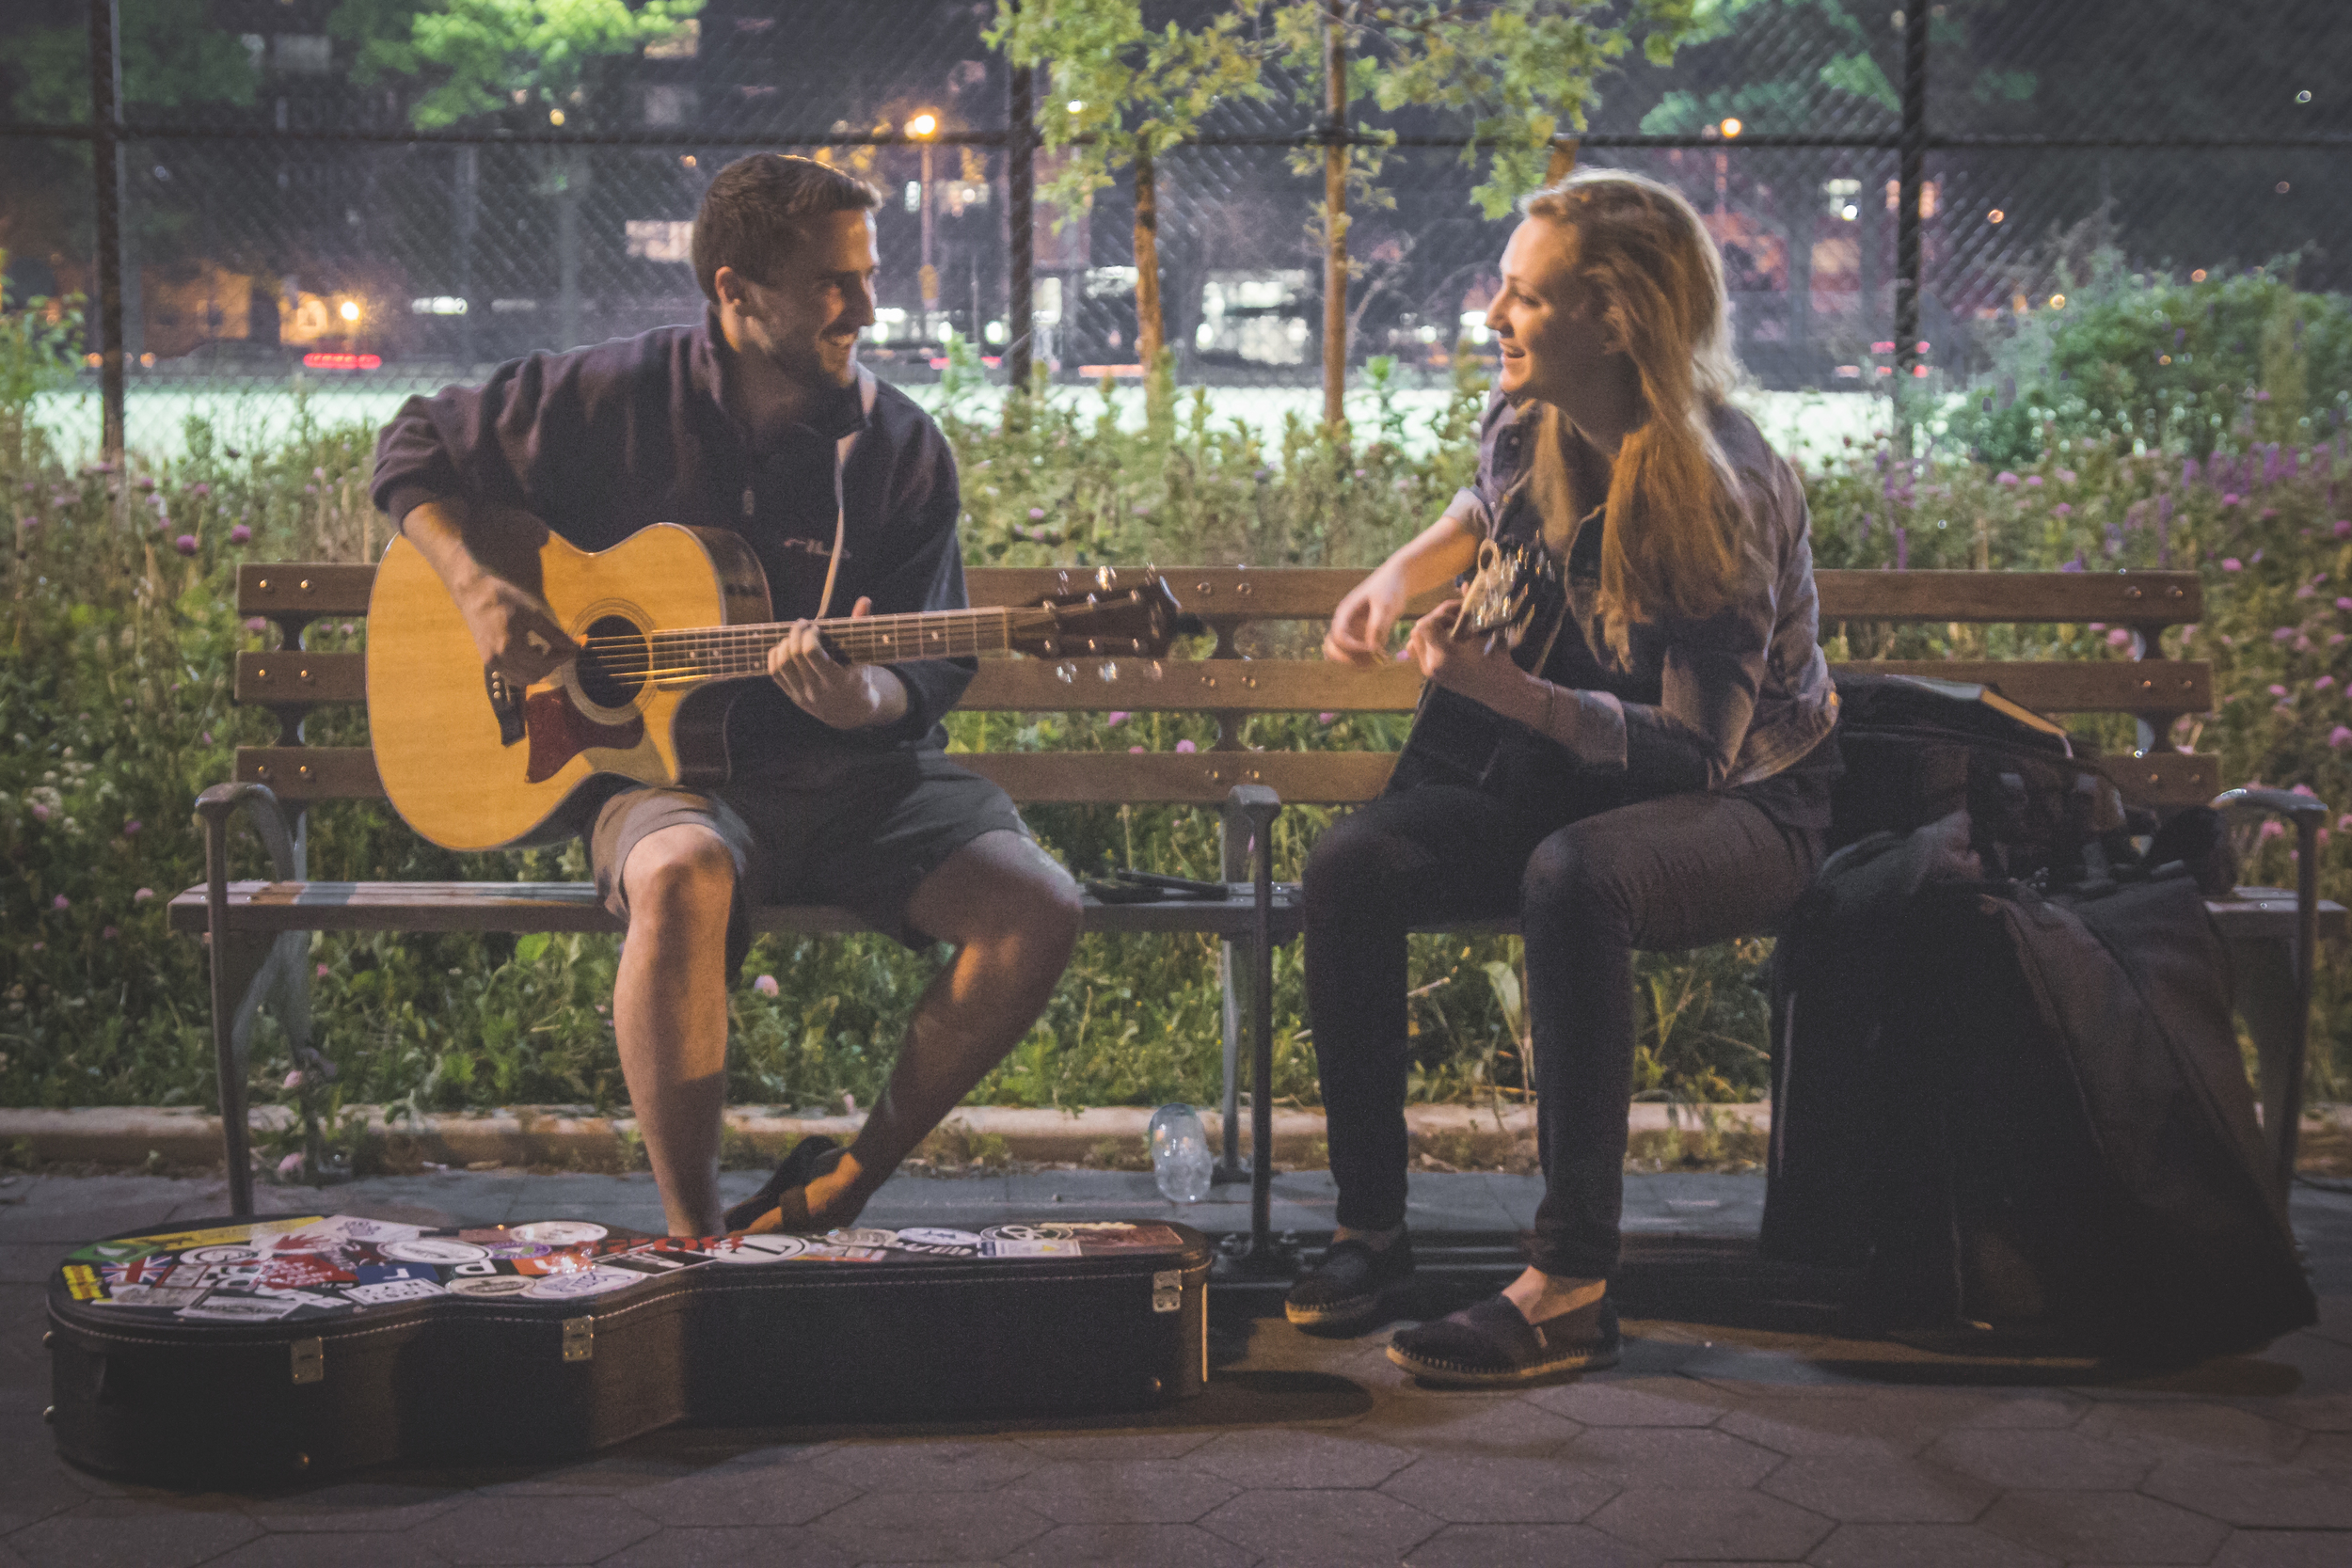 20150525 East River Night Shoot-8.jpg